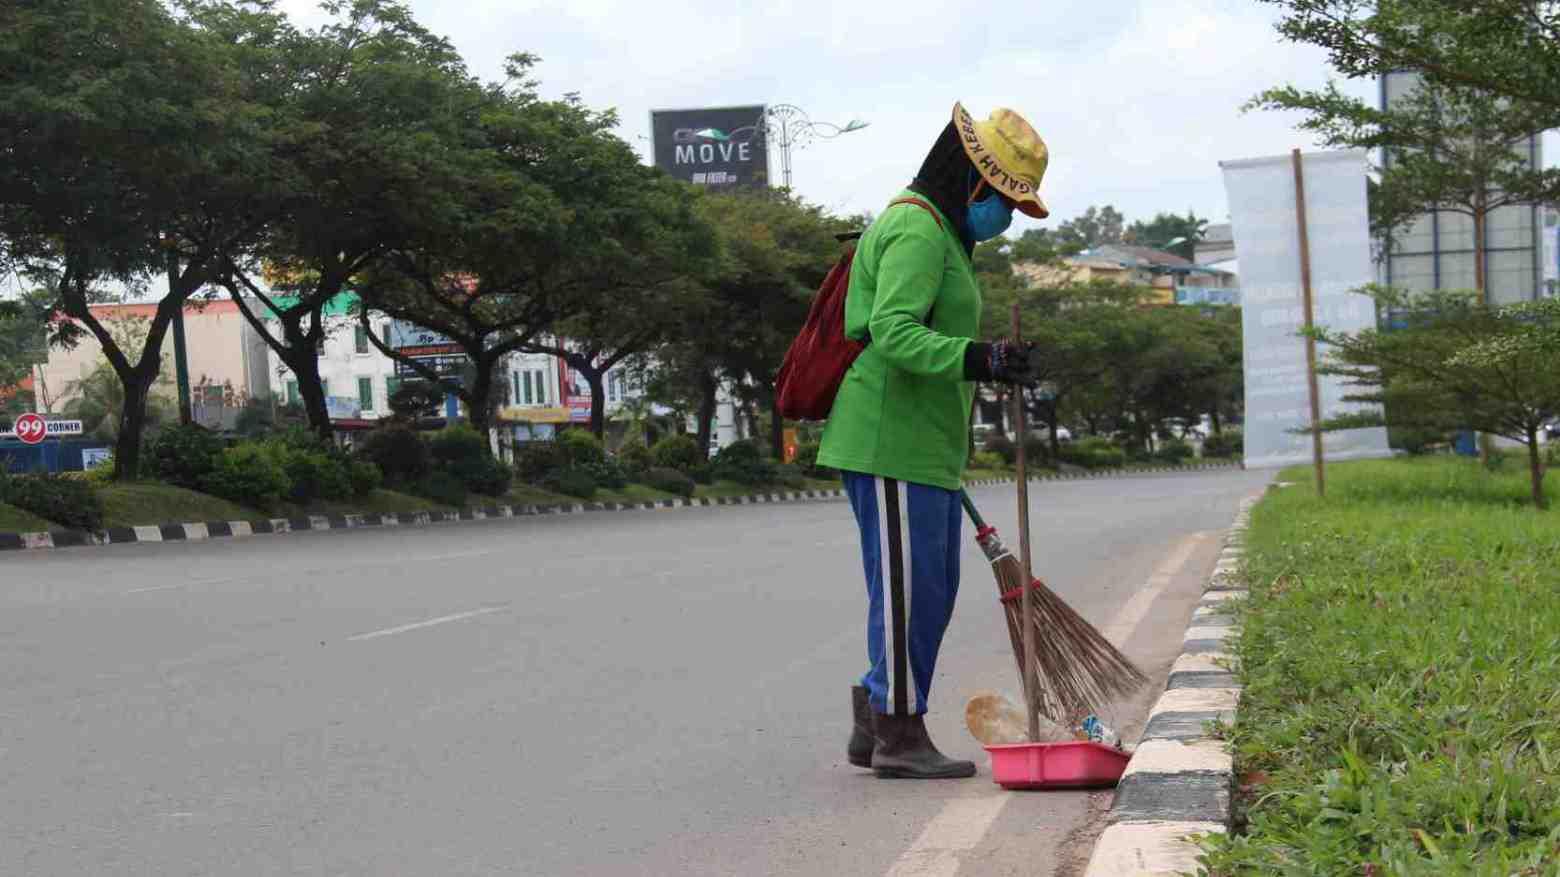 Pemkot Kendari Naikkan Gaji untuk Tingkatkan Kinerja Petugas Kebersihan